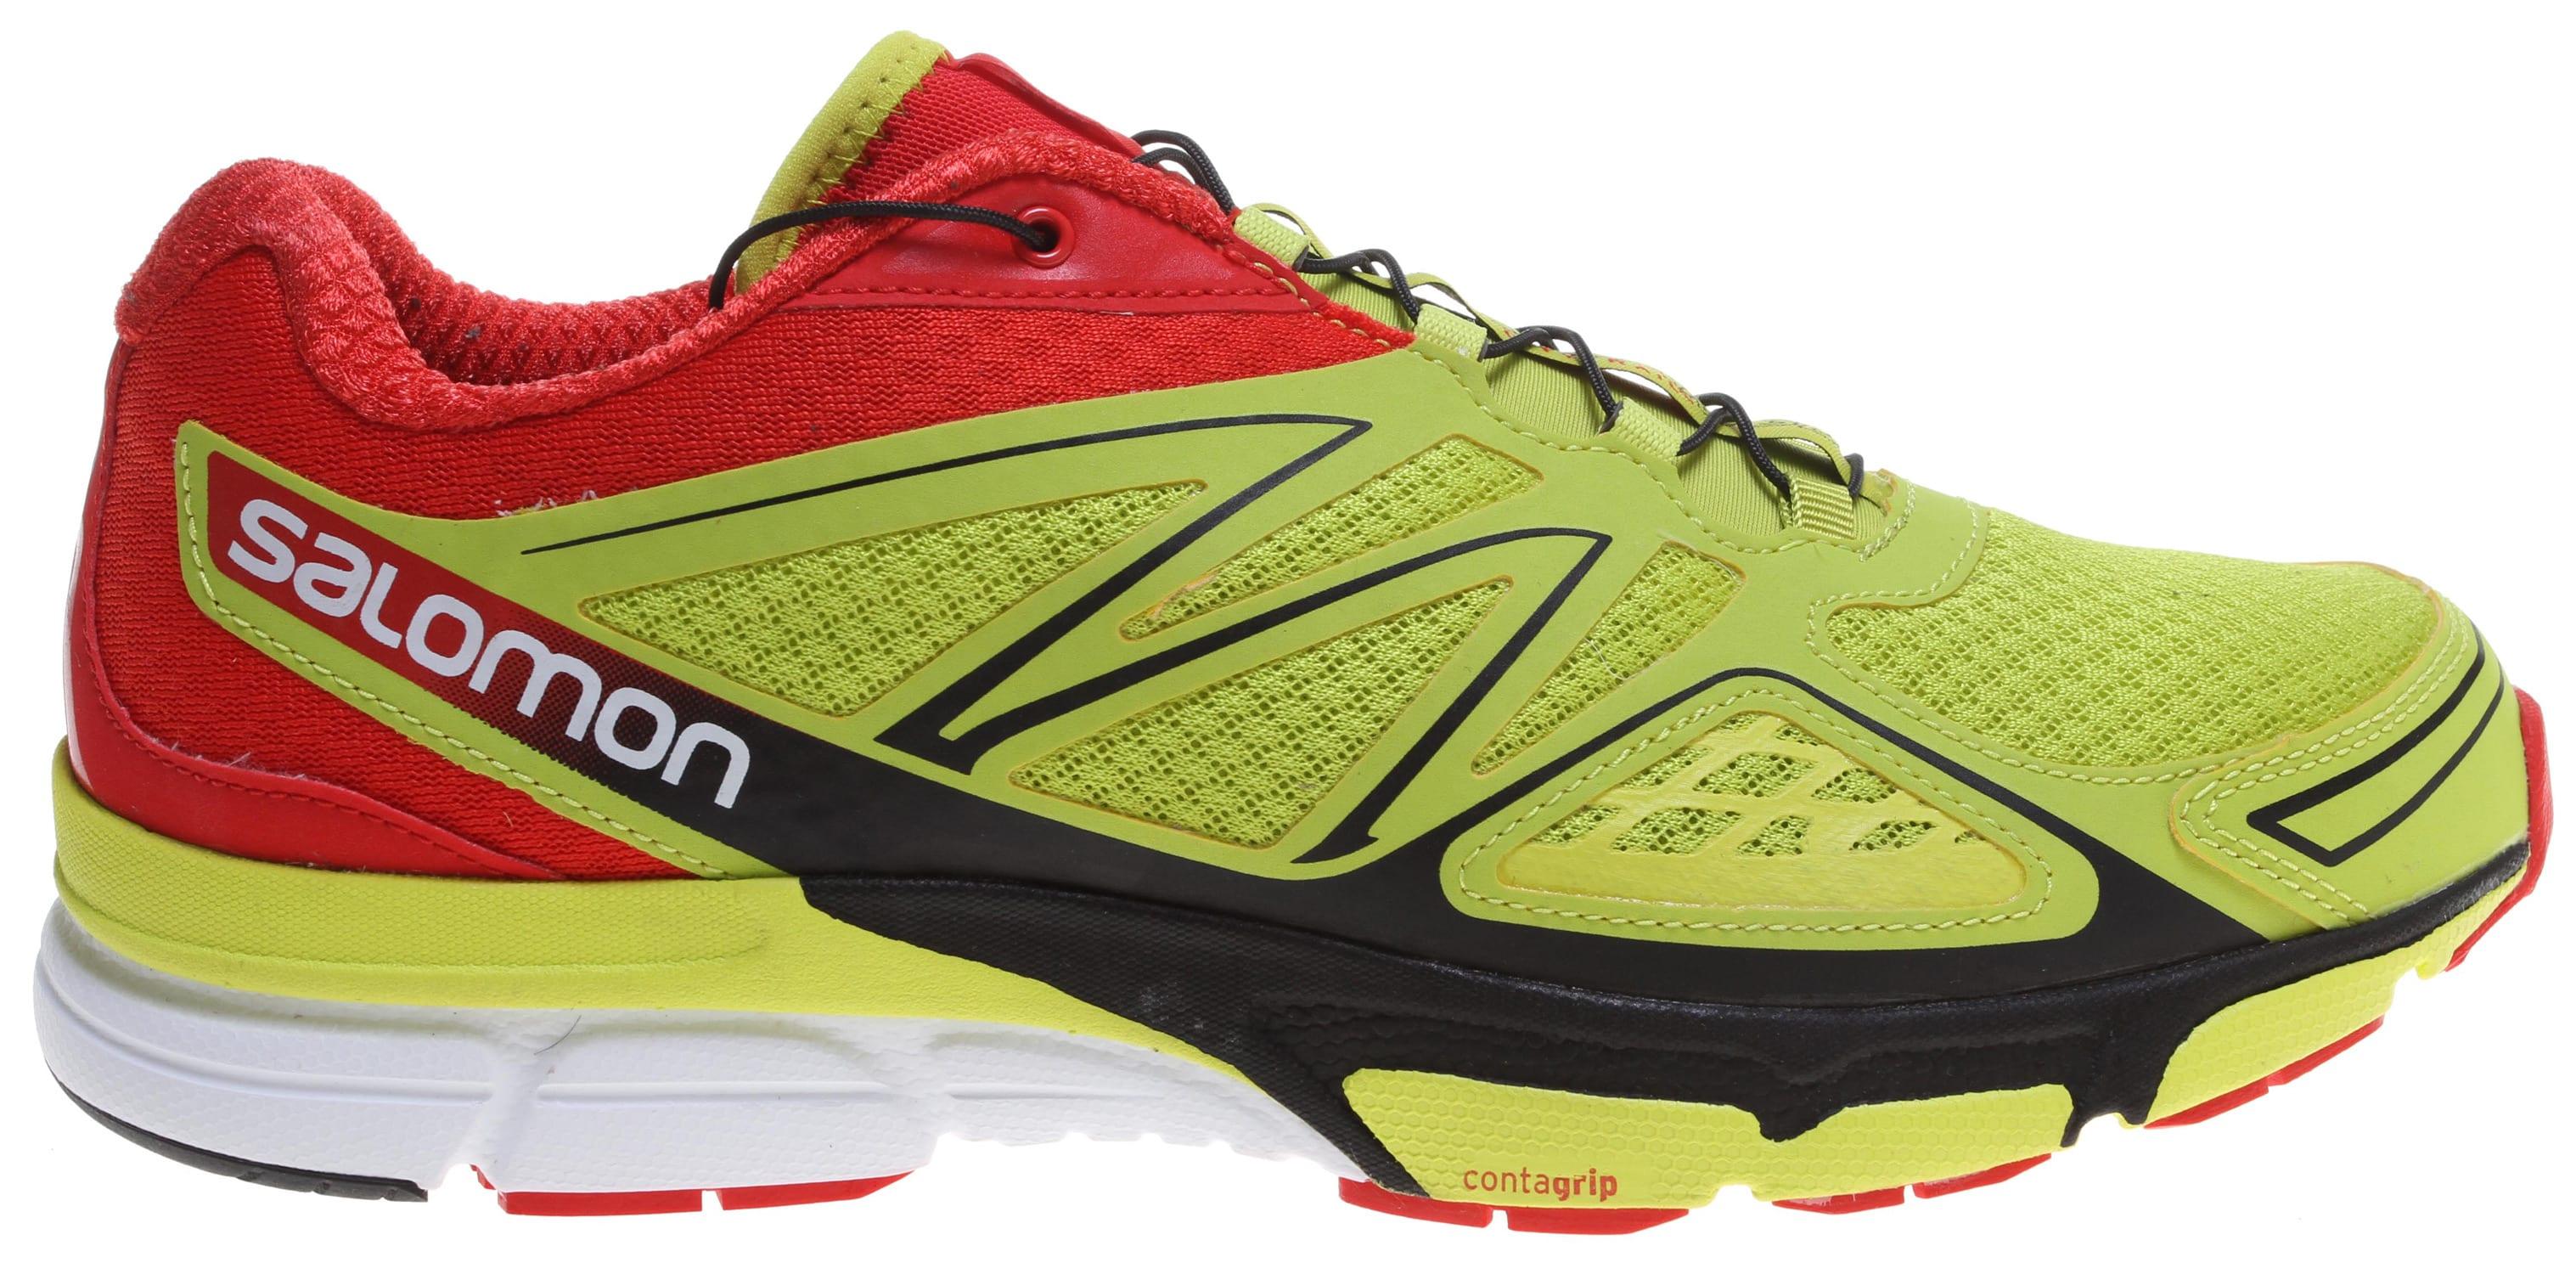 SALOMON X Scream 3D Mens Trail Running Shoe VNS7X5CVN